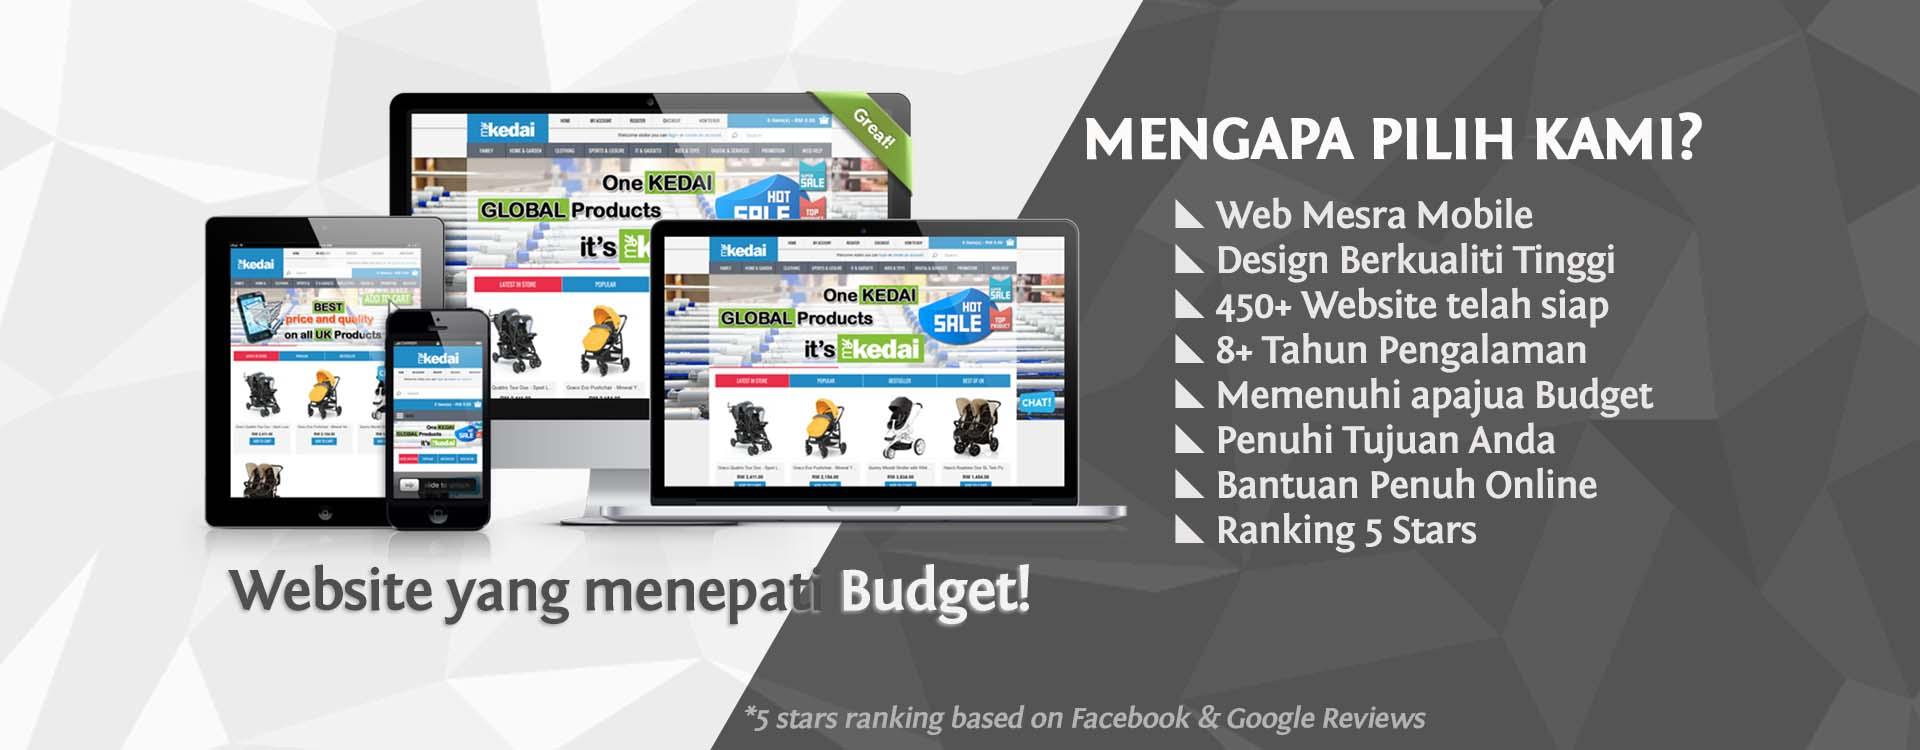 Malaysia Best Web Designer